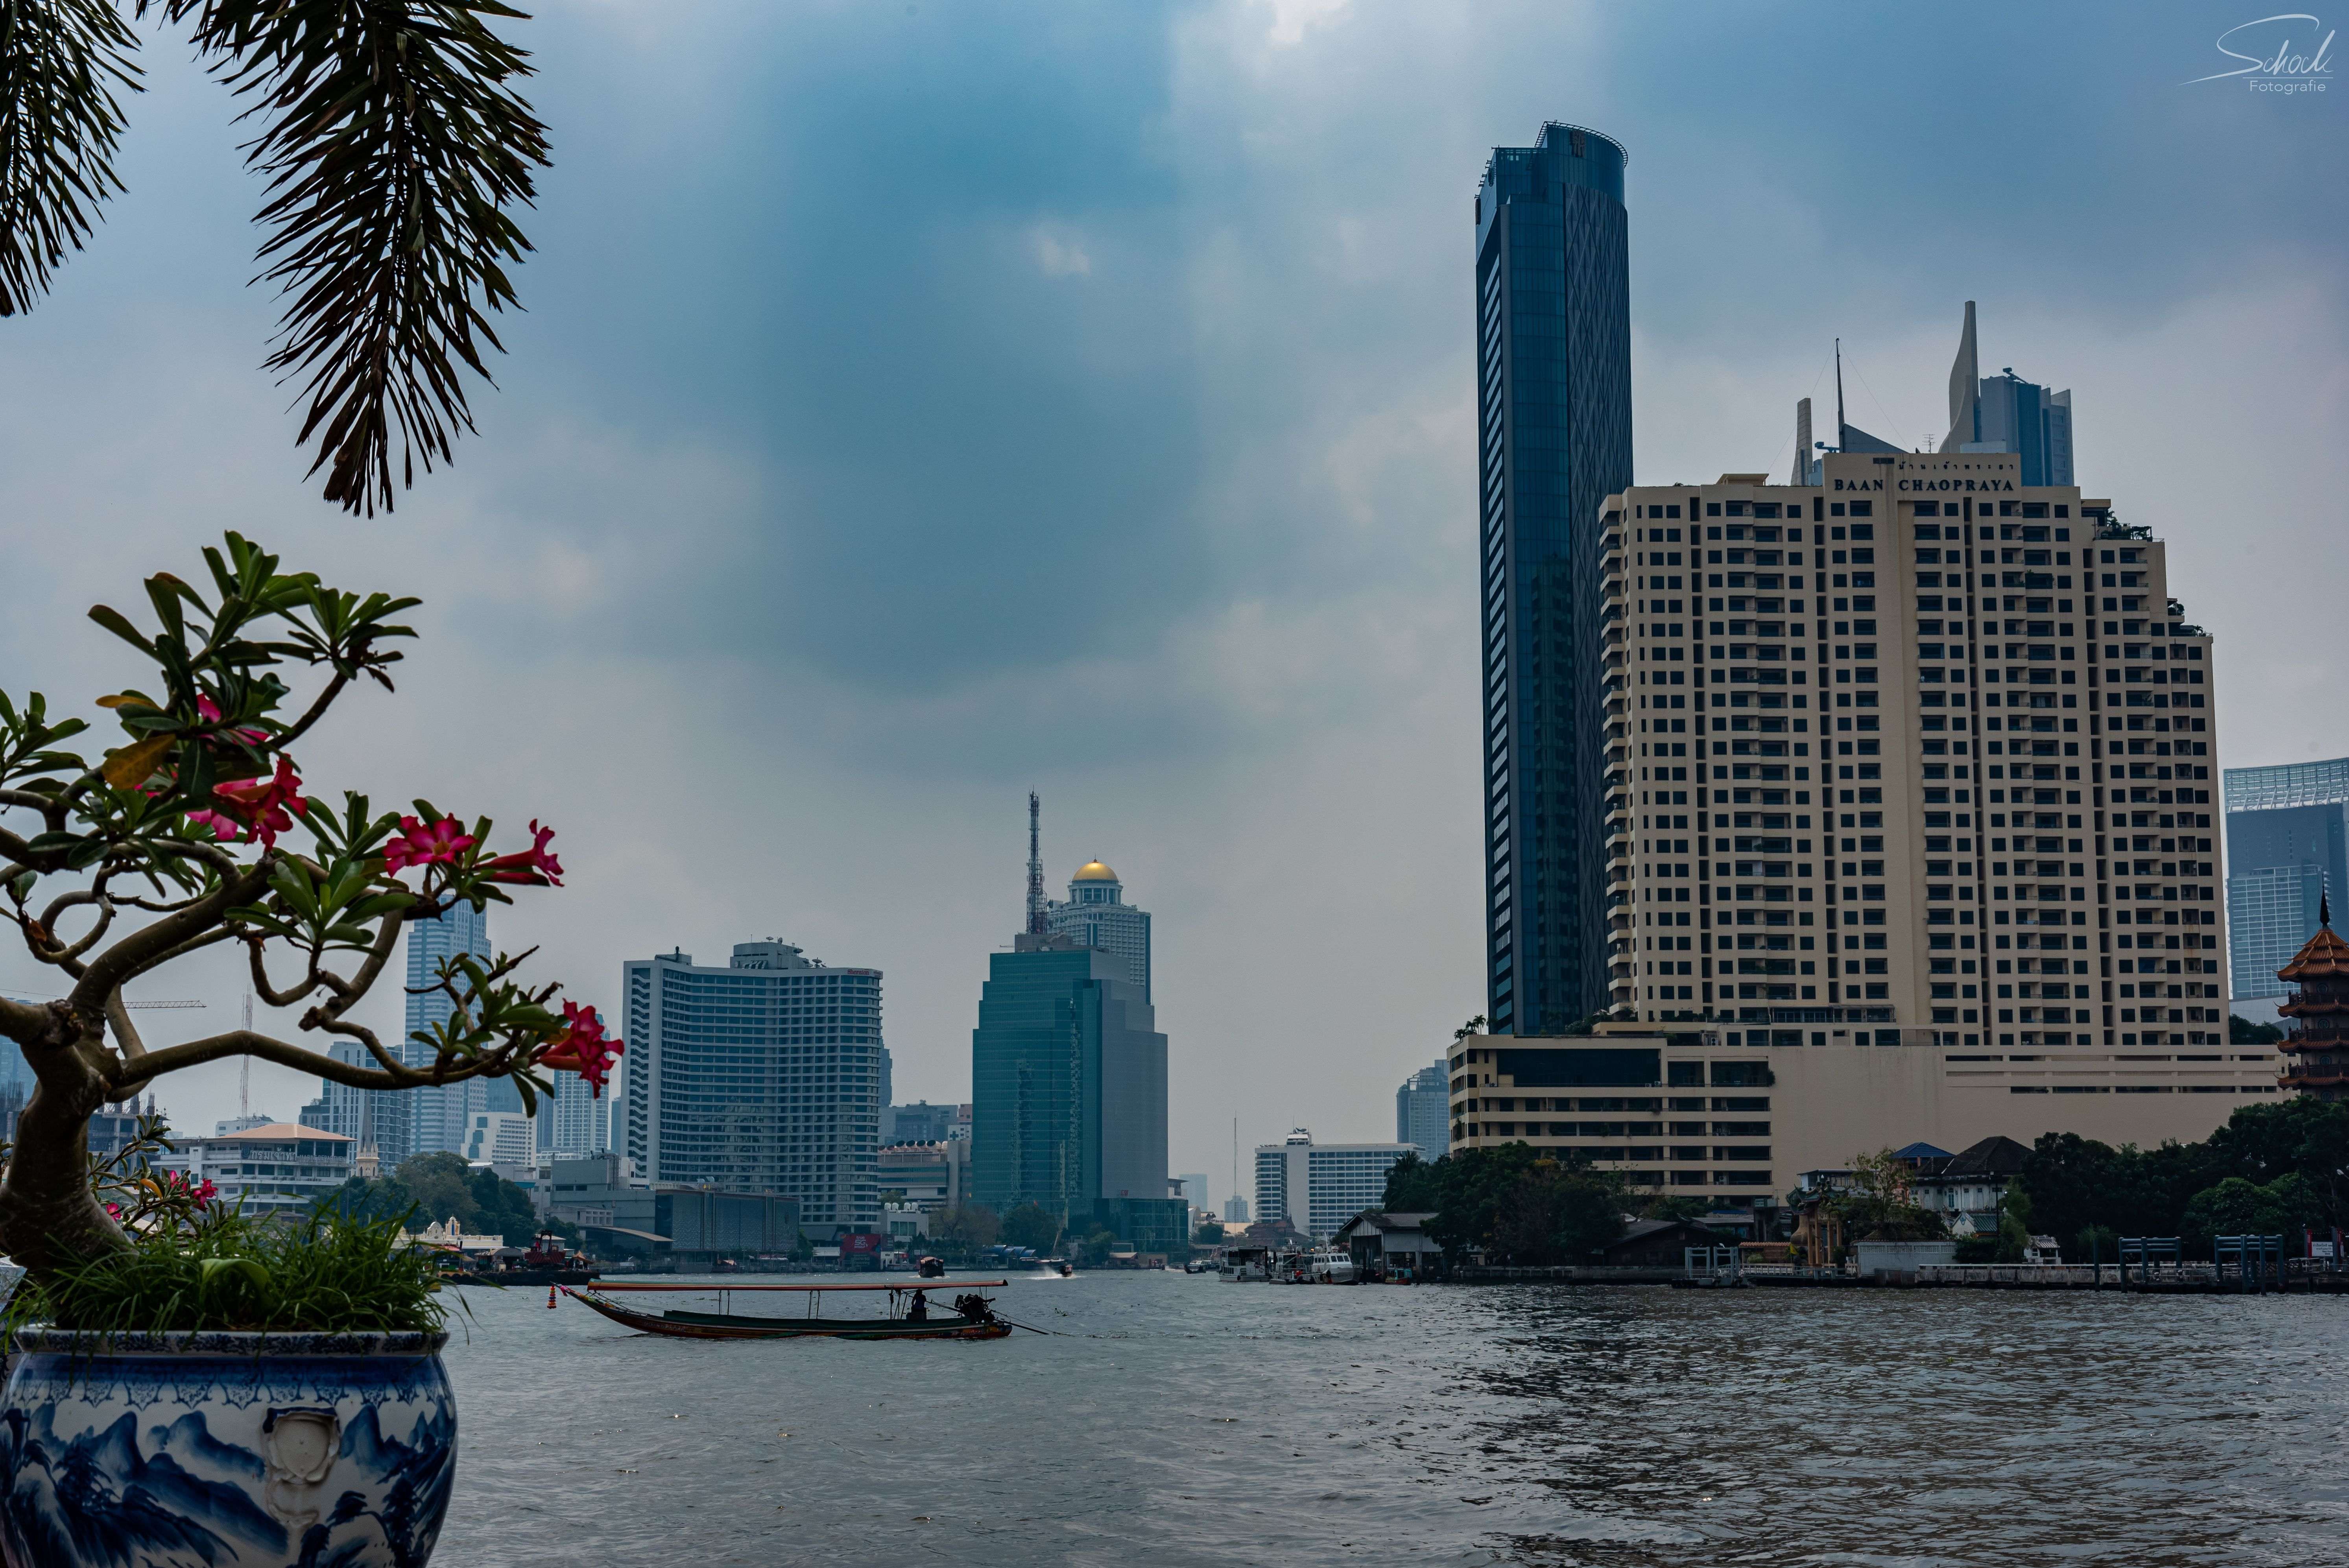 Chao Phraya Bangkok In 2020 San Francisco Skyline New York Skyline Bangkok